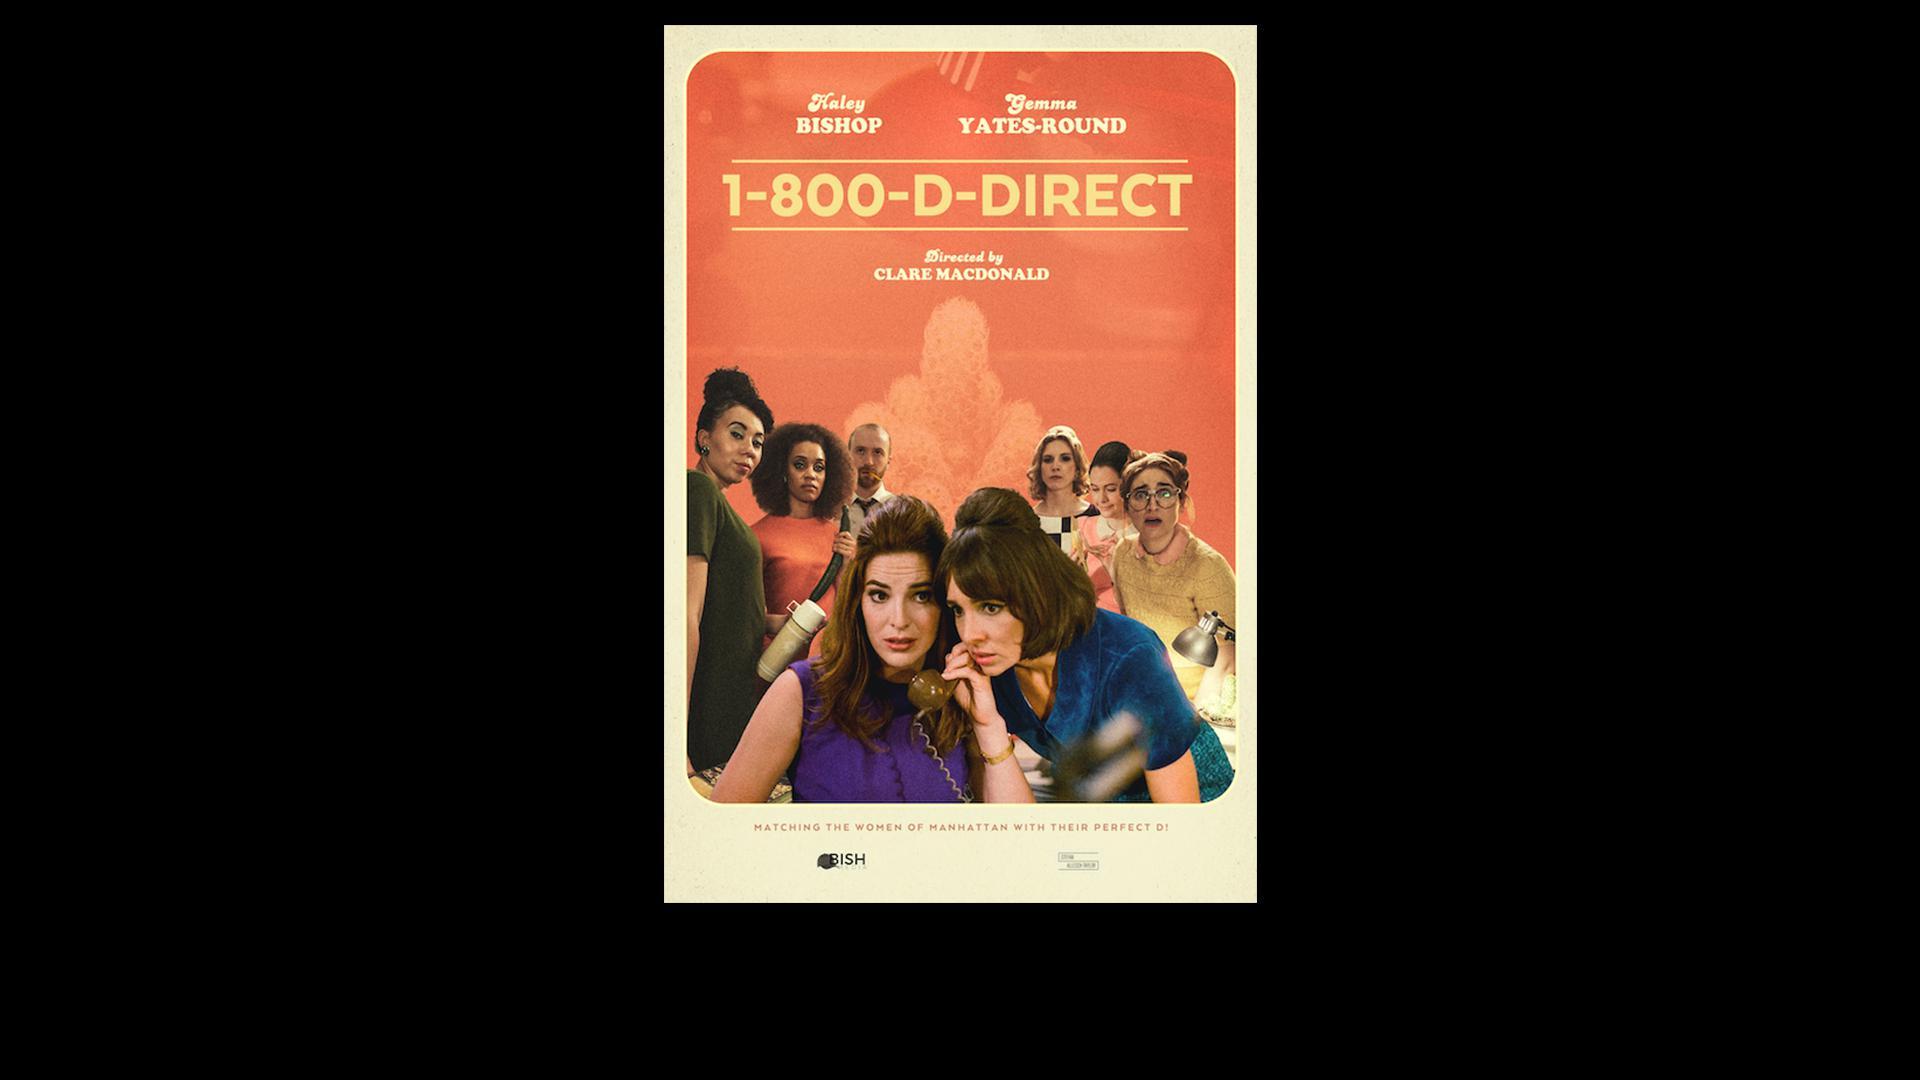 1-800-D-Direct